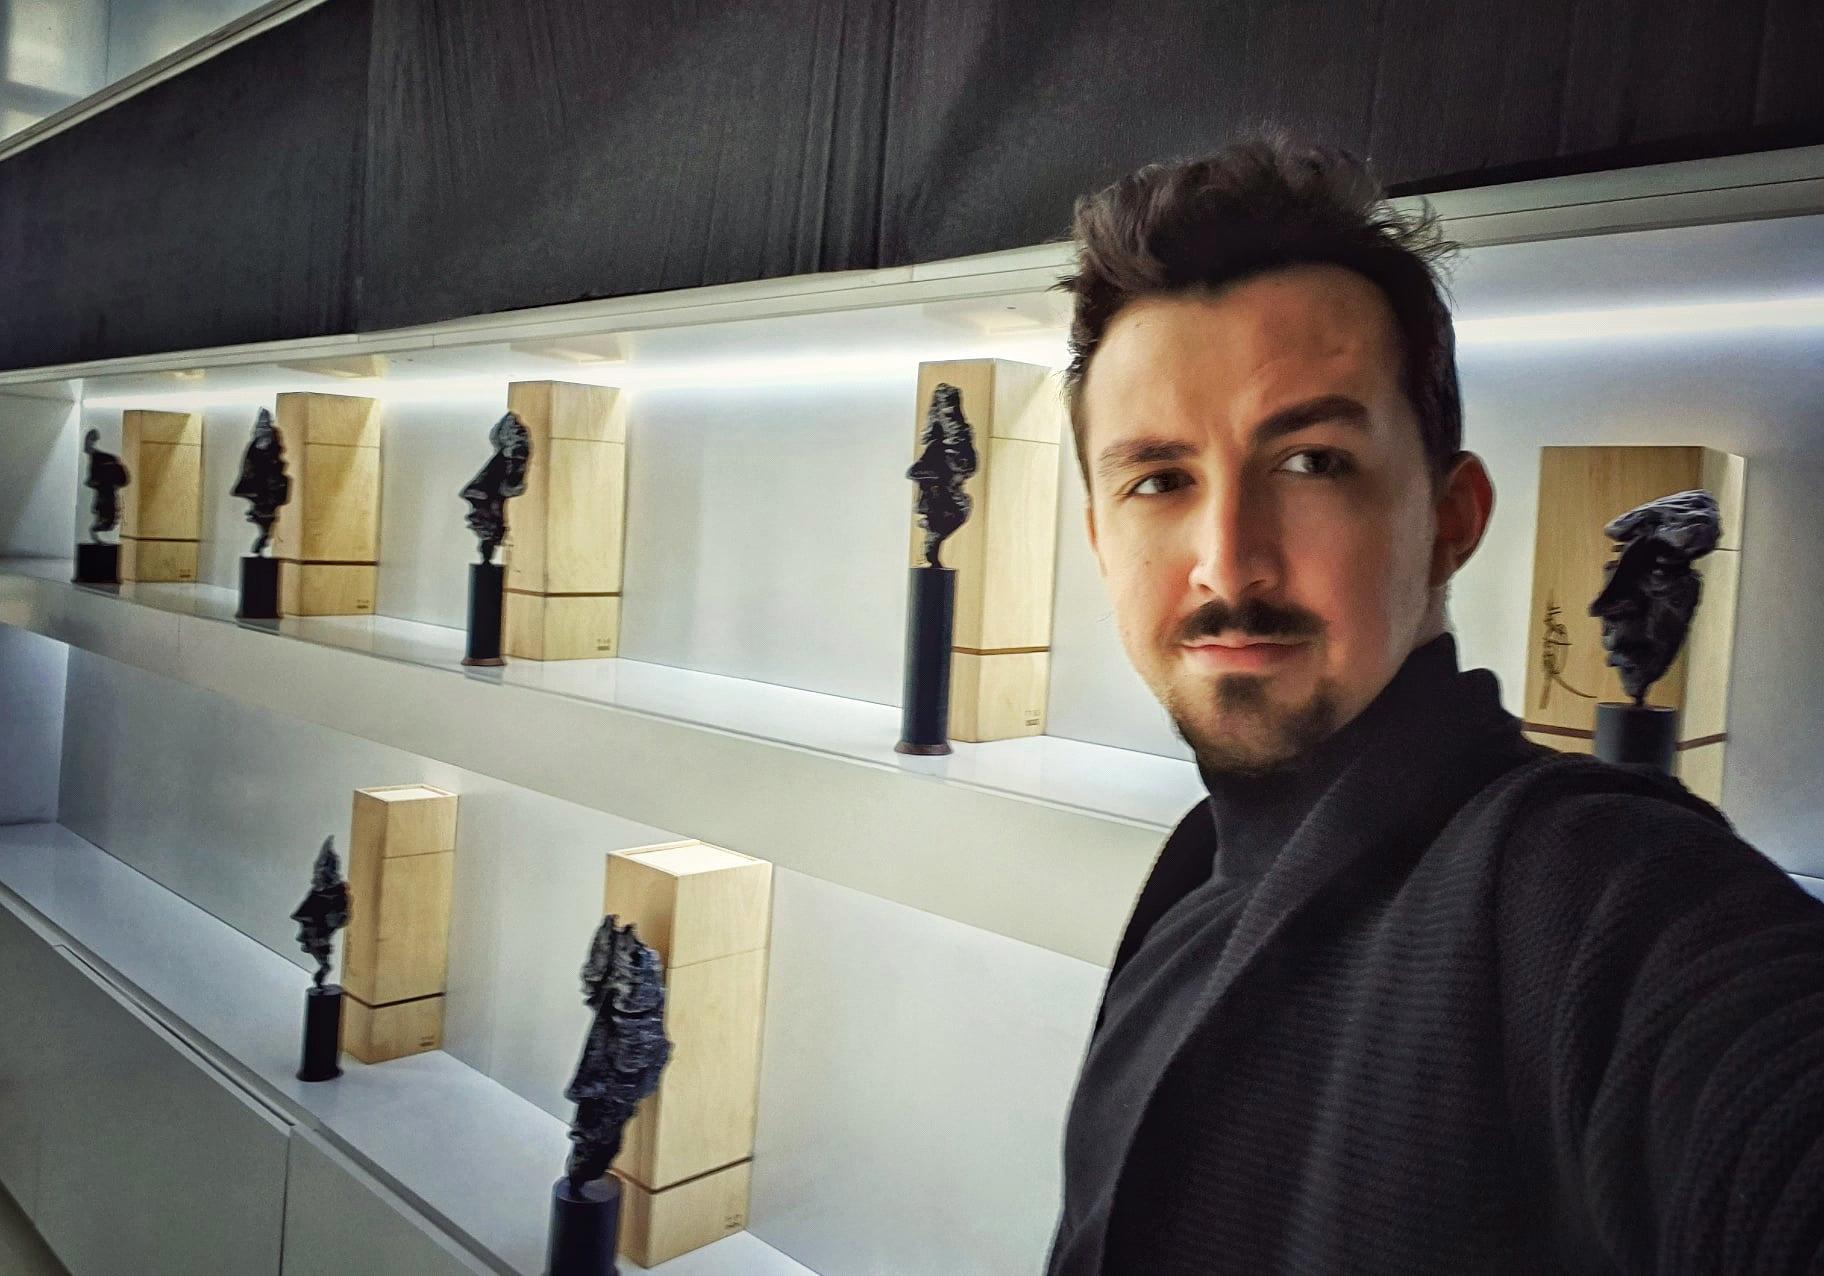 https://artpres.ro/wp-content/uploads/2021/01/Daniel-Radulescu-3.png